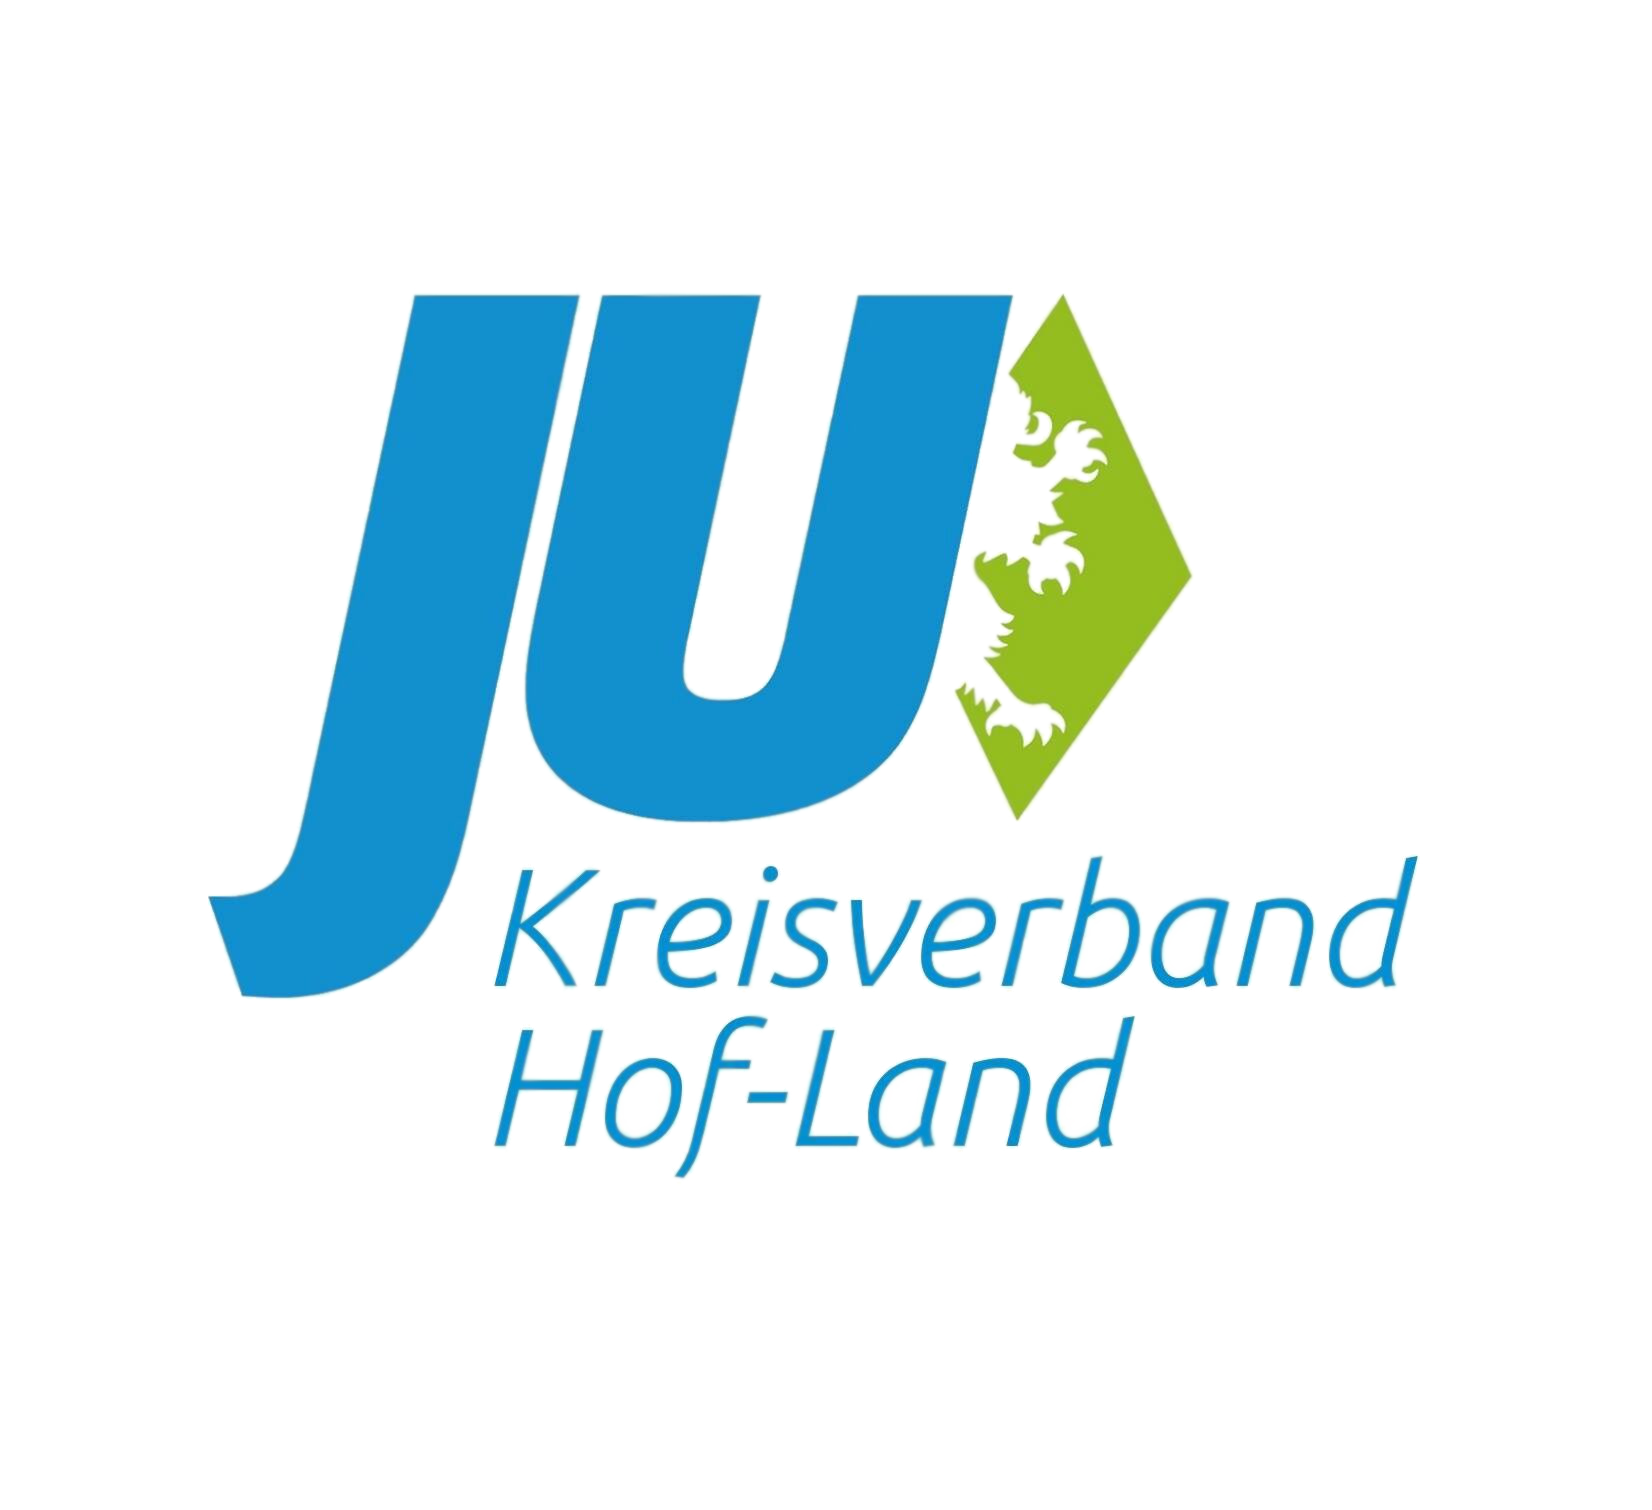 Bild Logo PNG2 JU Hof-Land